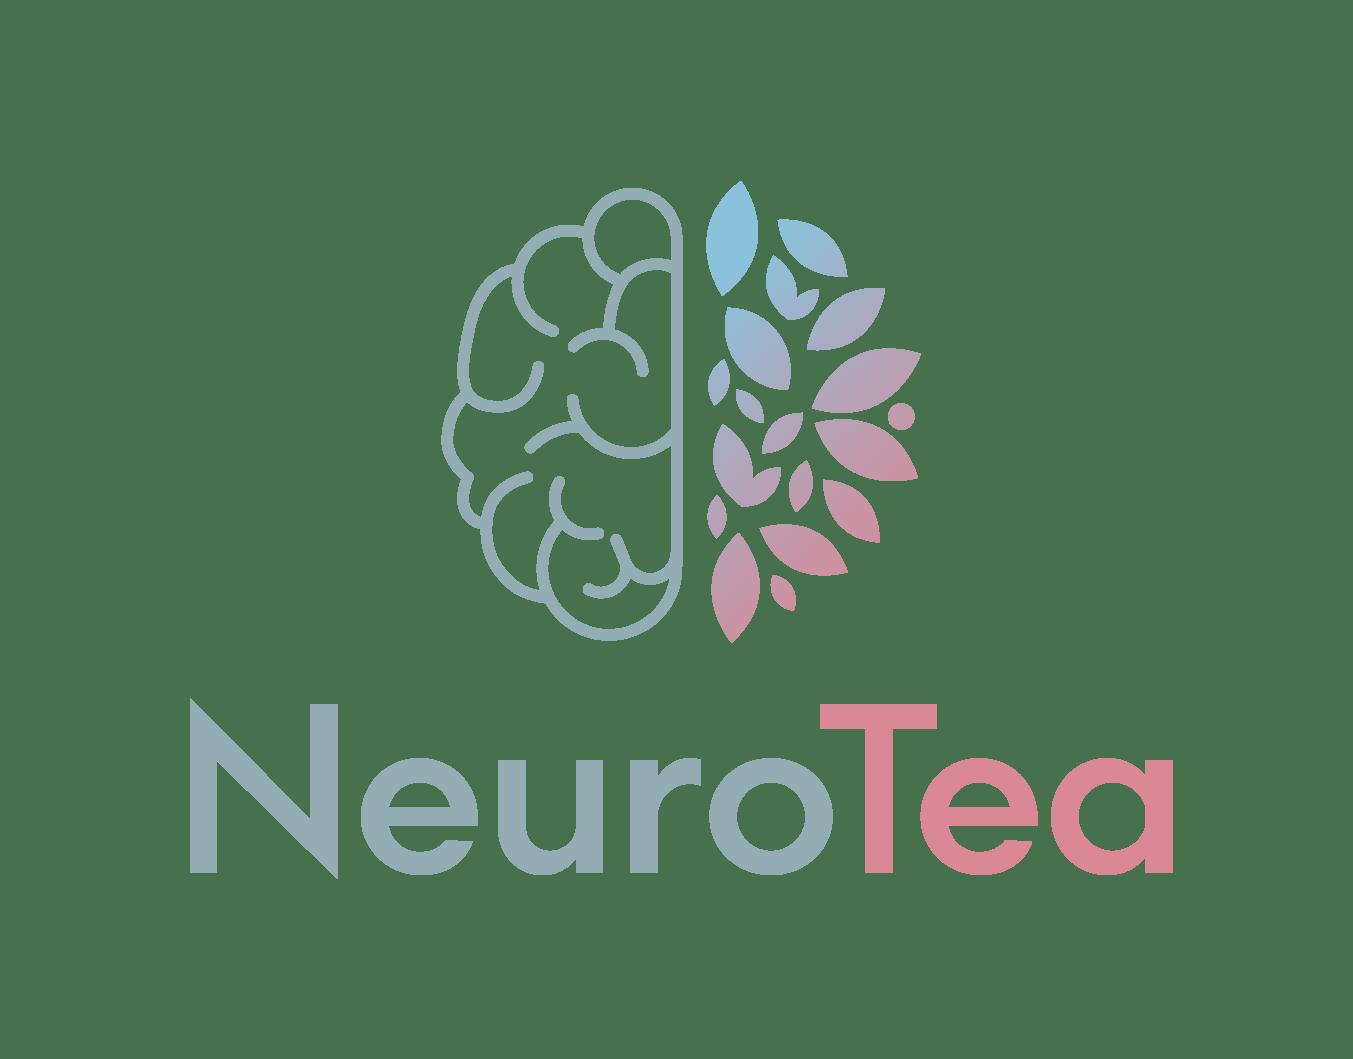 NeuroTea Giveaway